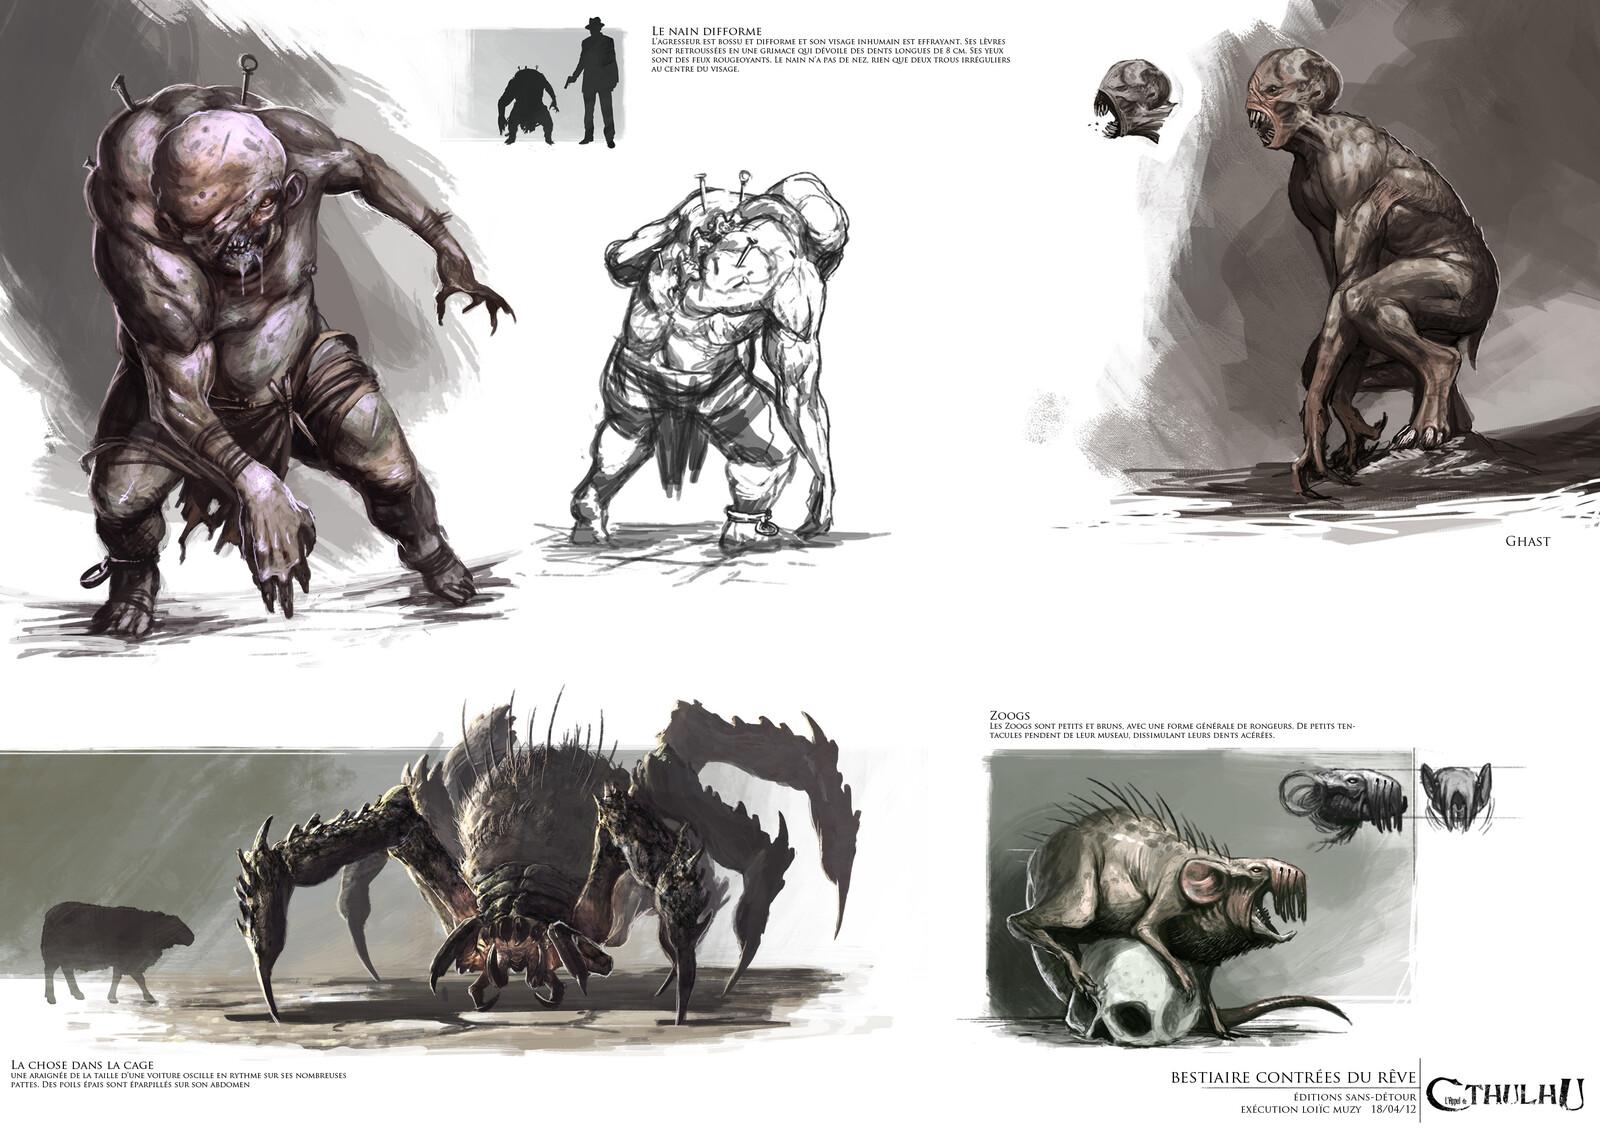 deformed dwarf , giant spider, Ghast, zoogs